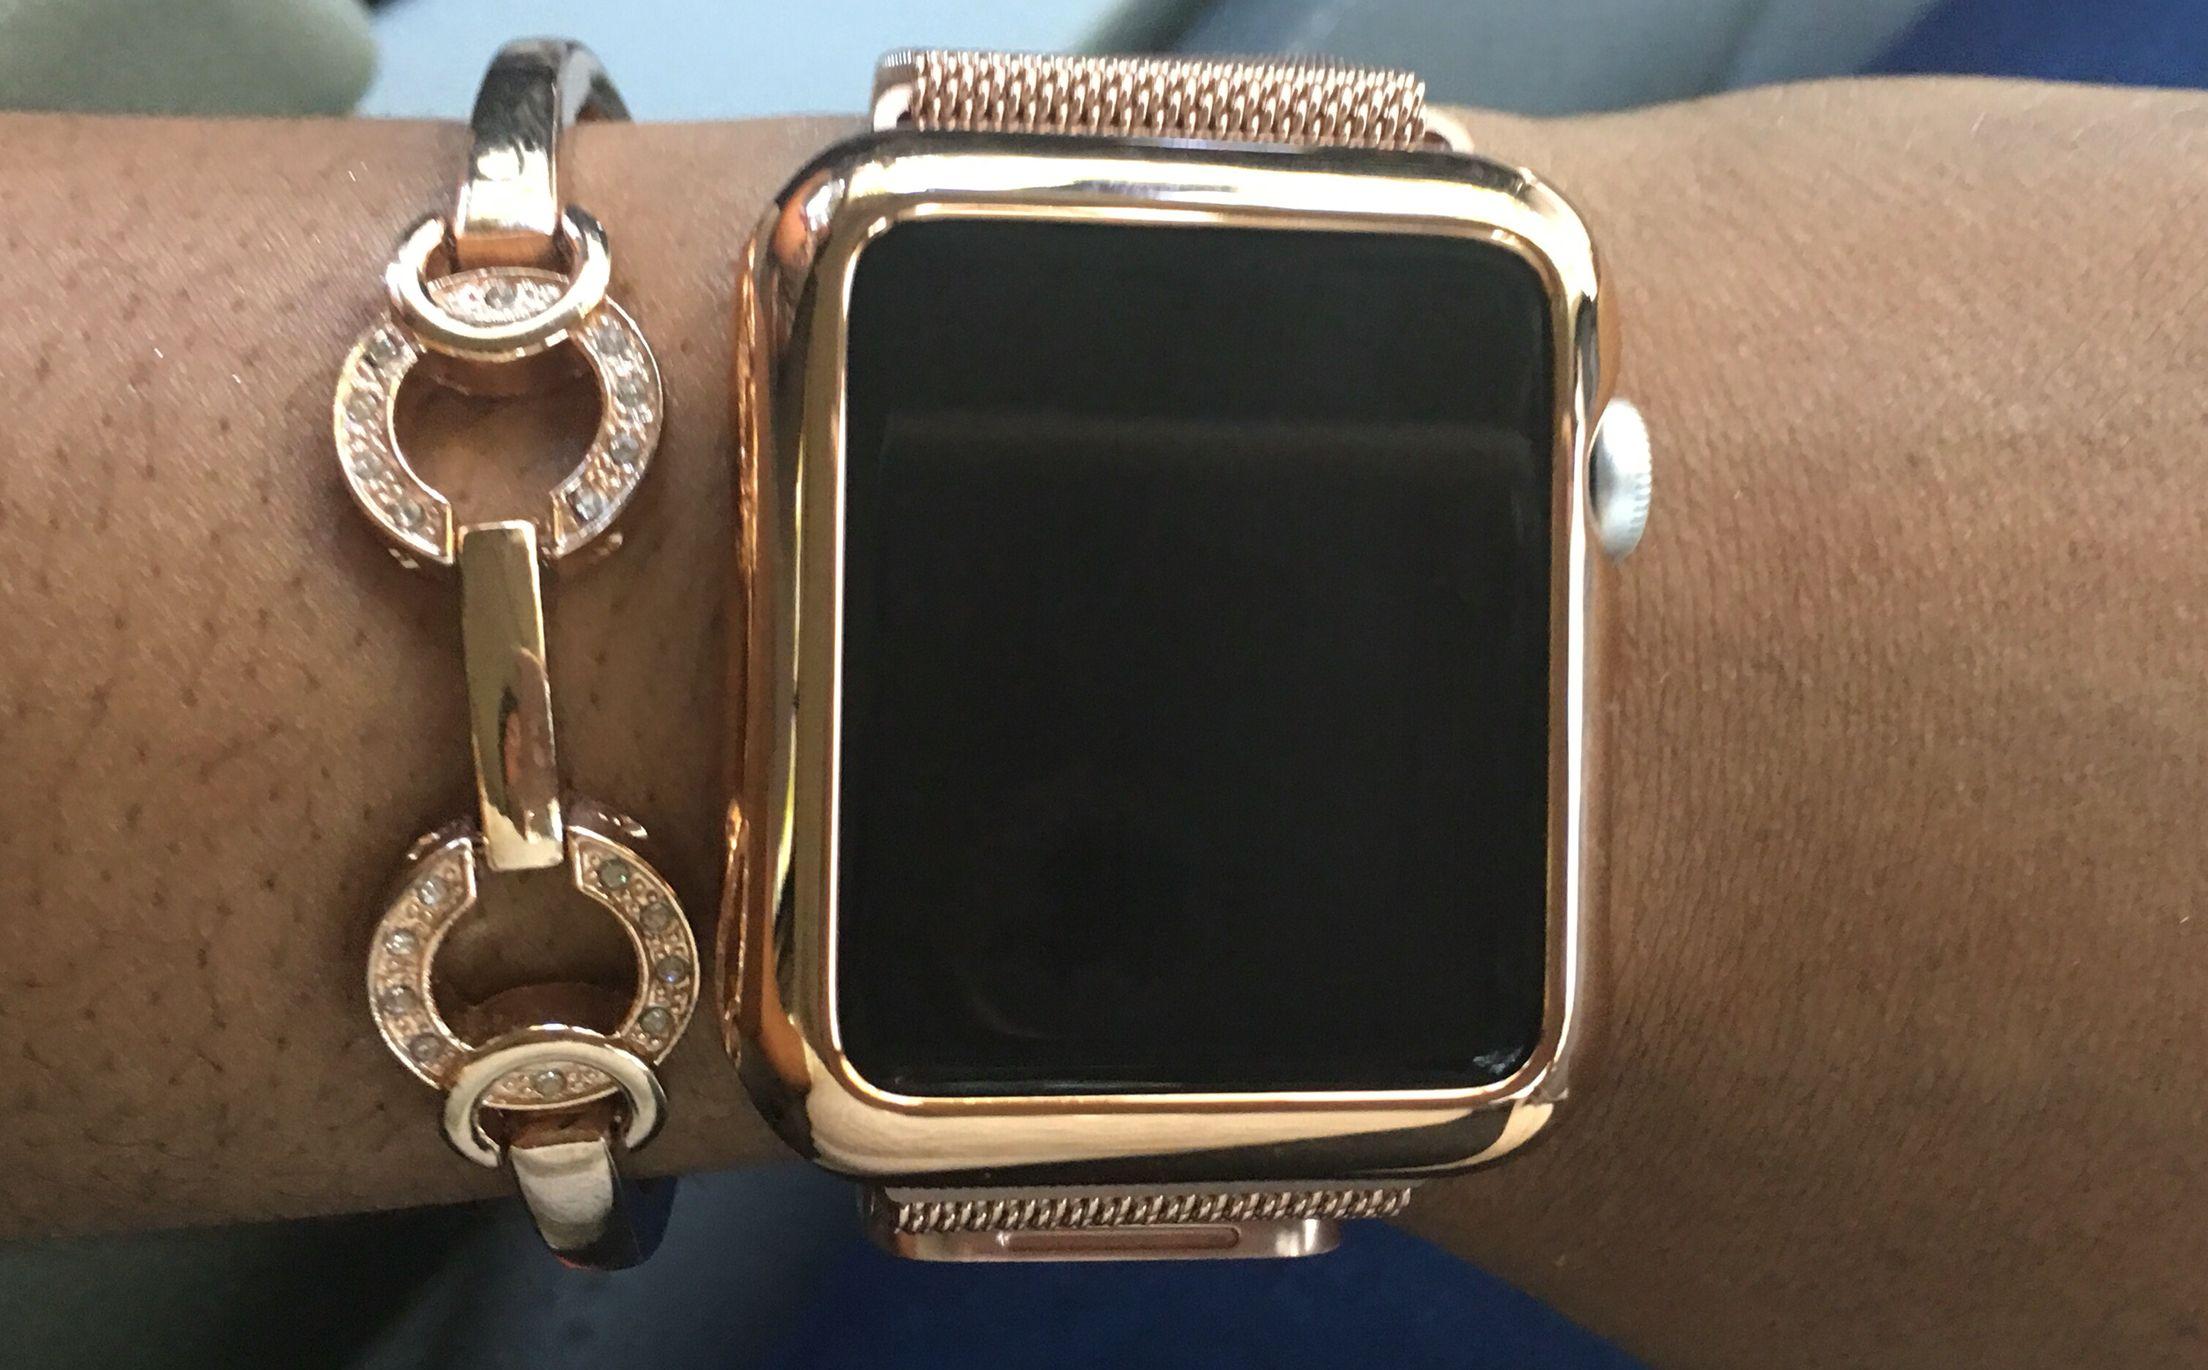 Rose gold apple watch apple watch pinterest rose gold apple watch and gold apple watch for Rose gold apple watch